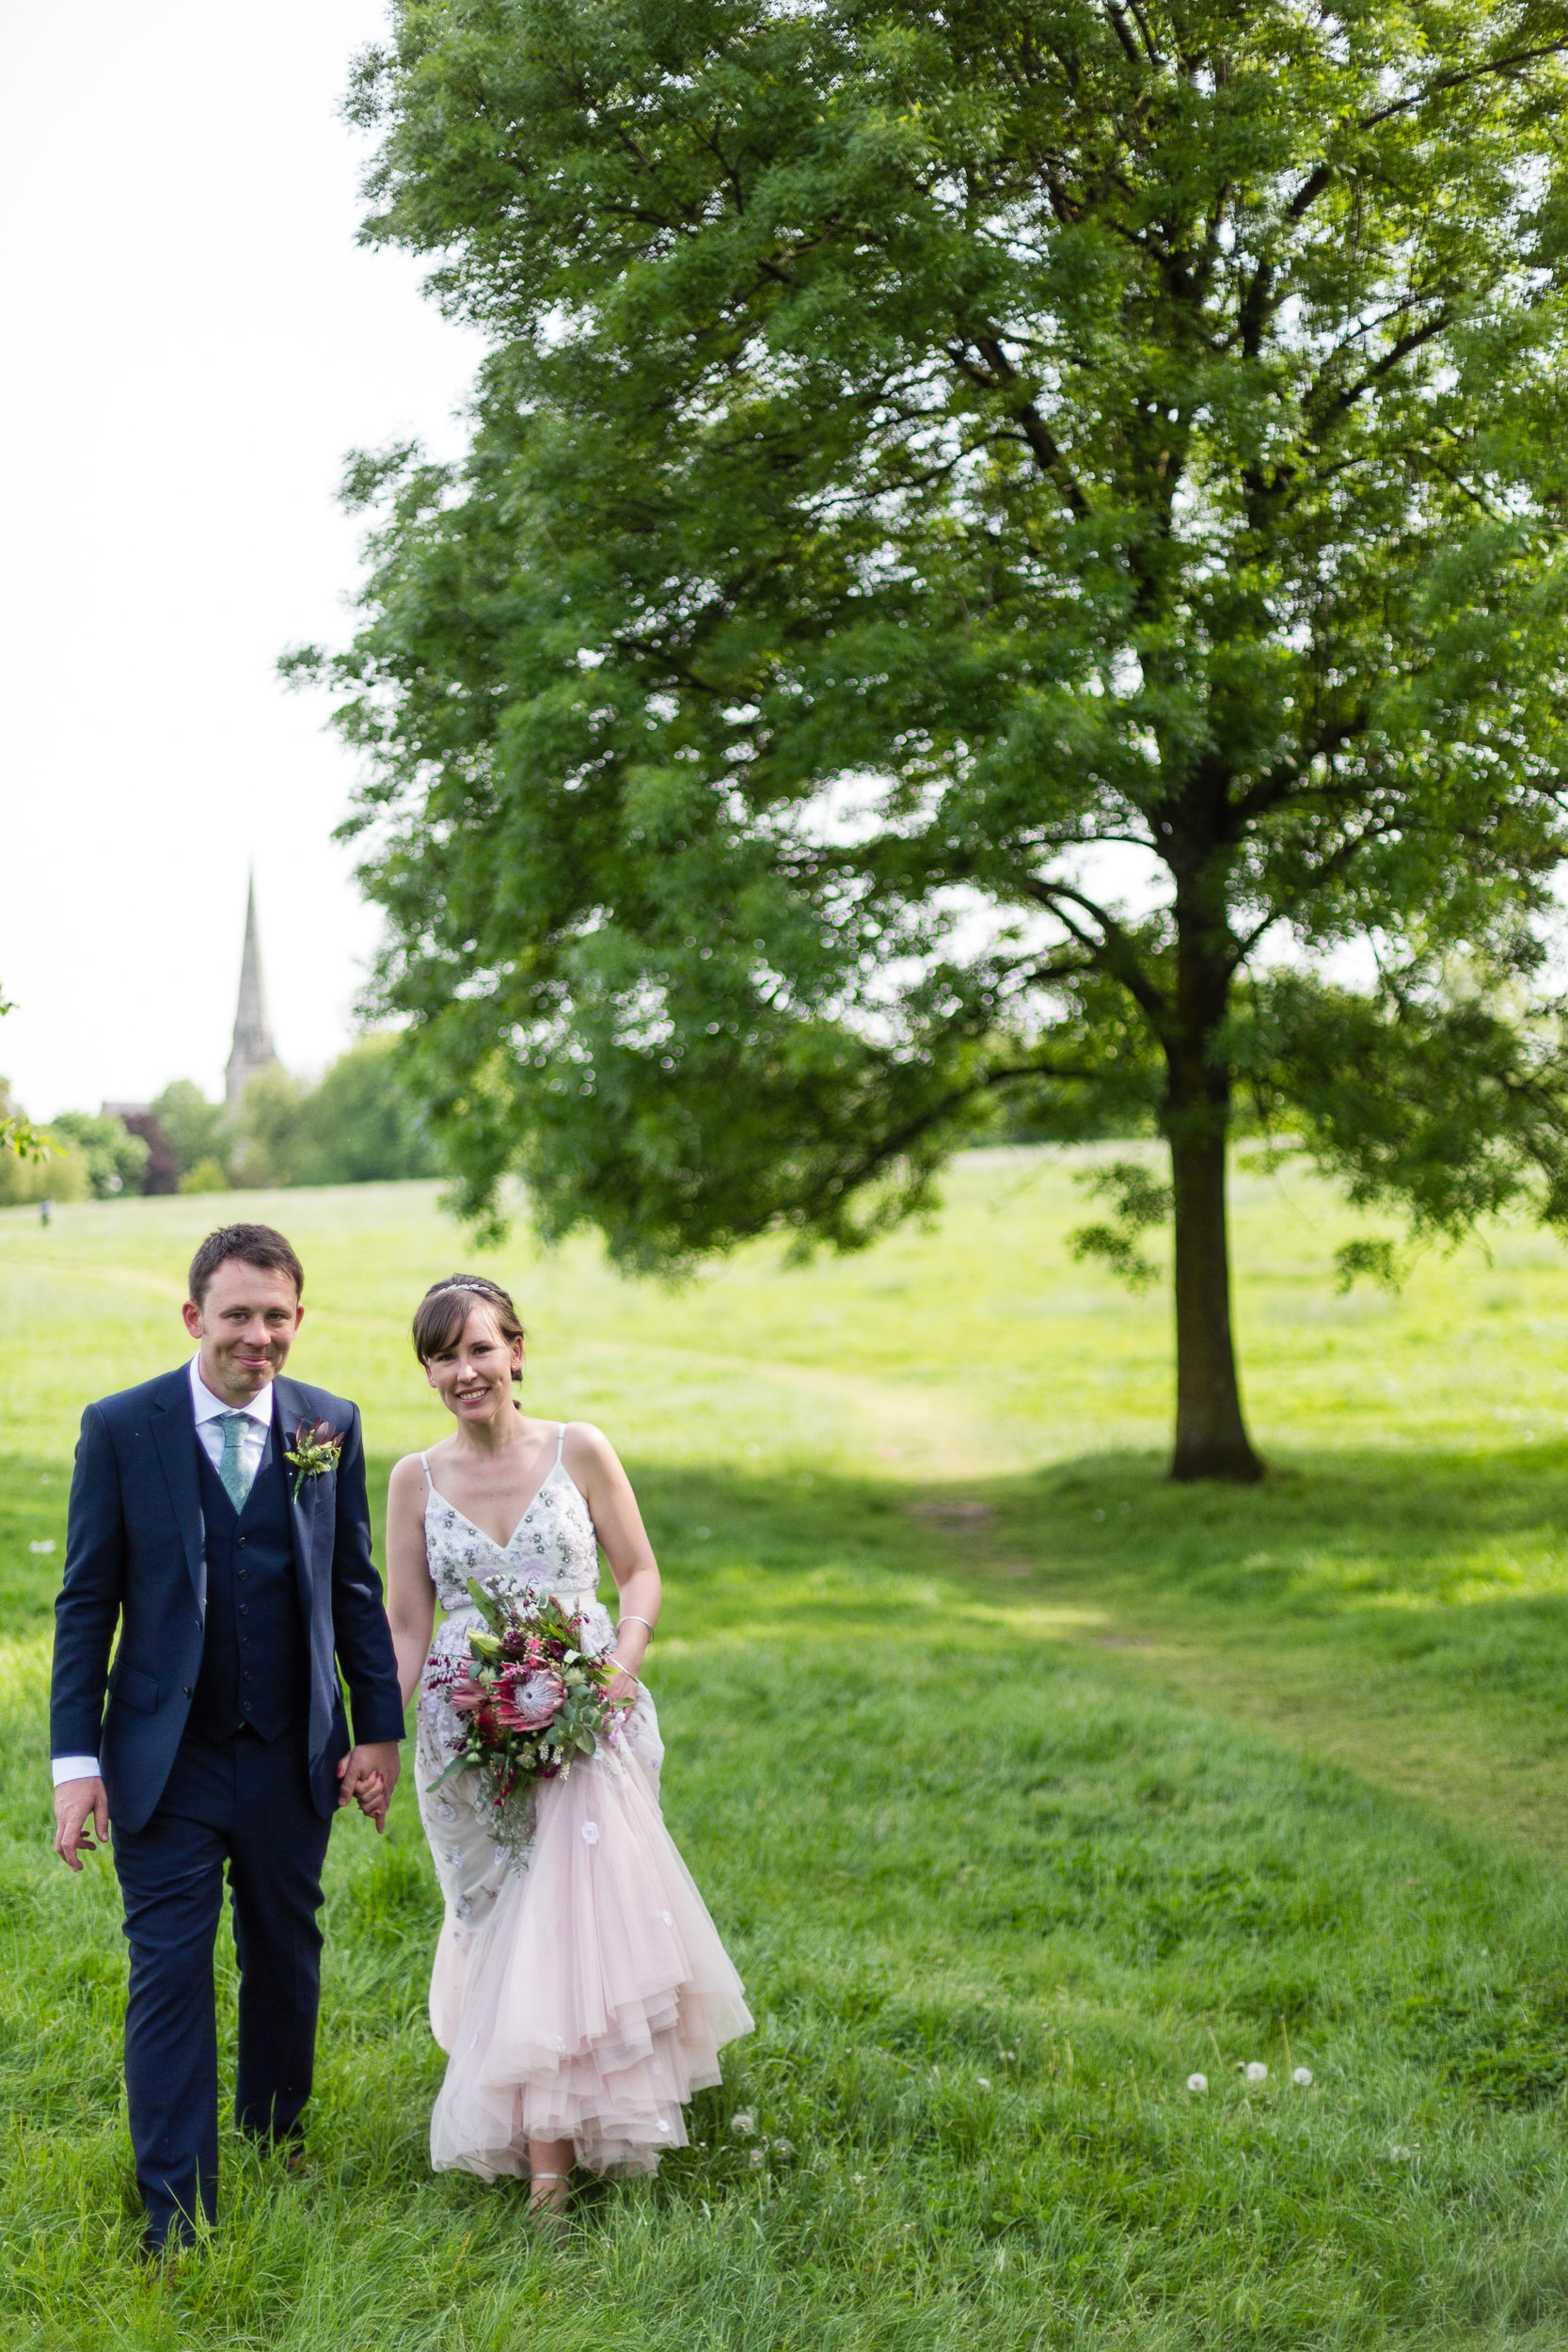 brockwell-lido-brixton-herne-hill-wedding-289.jpg